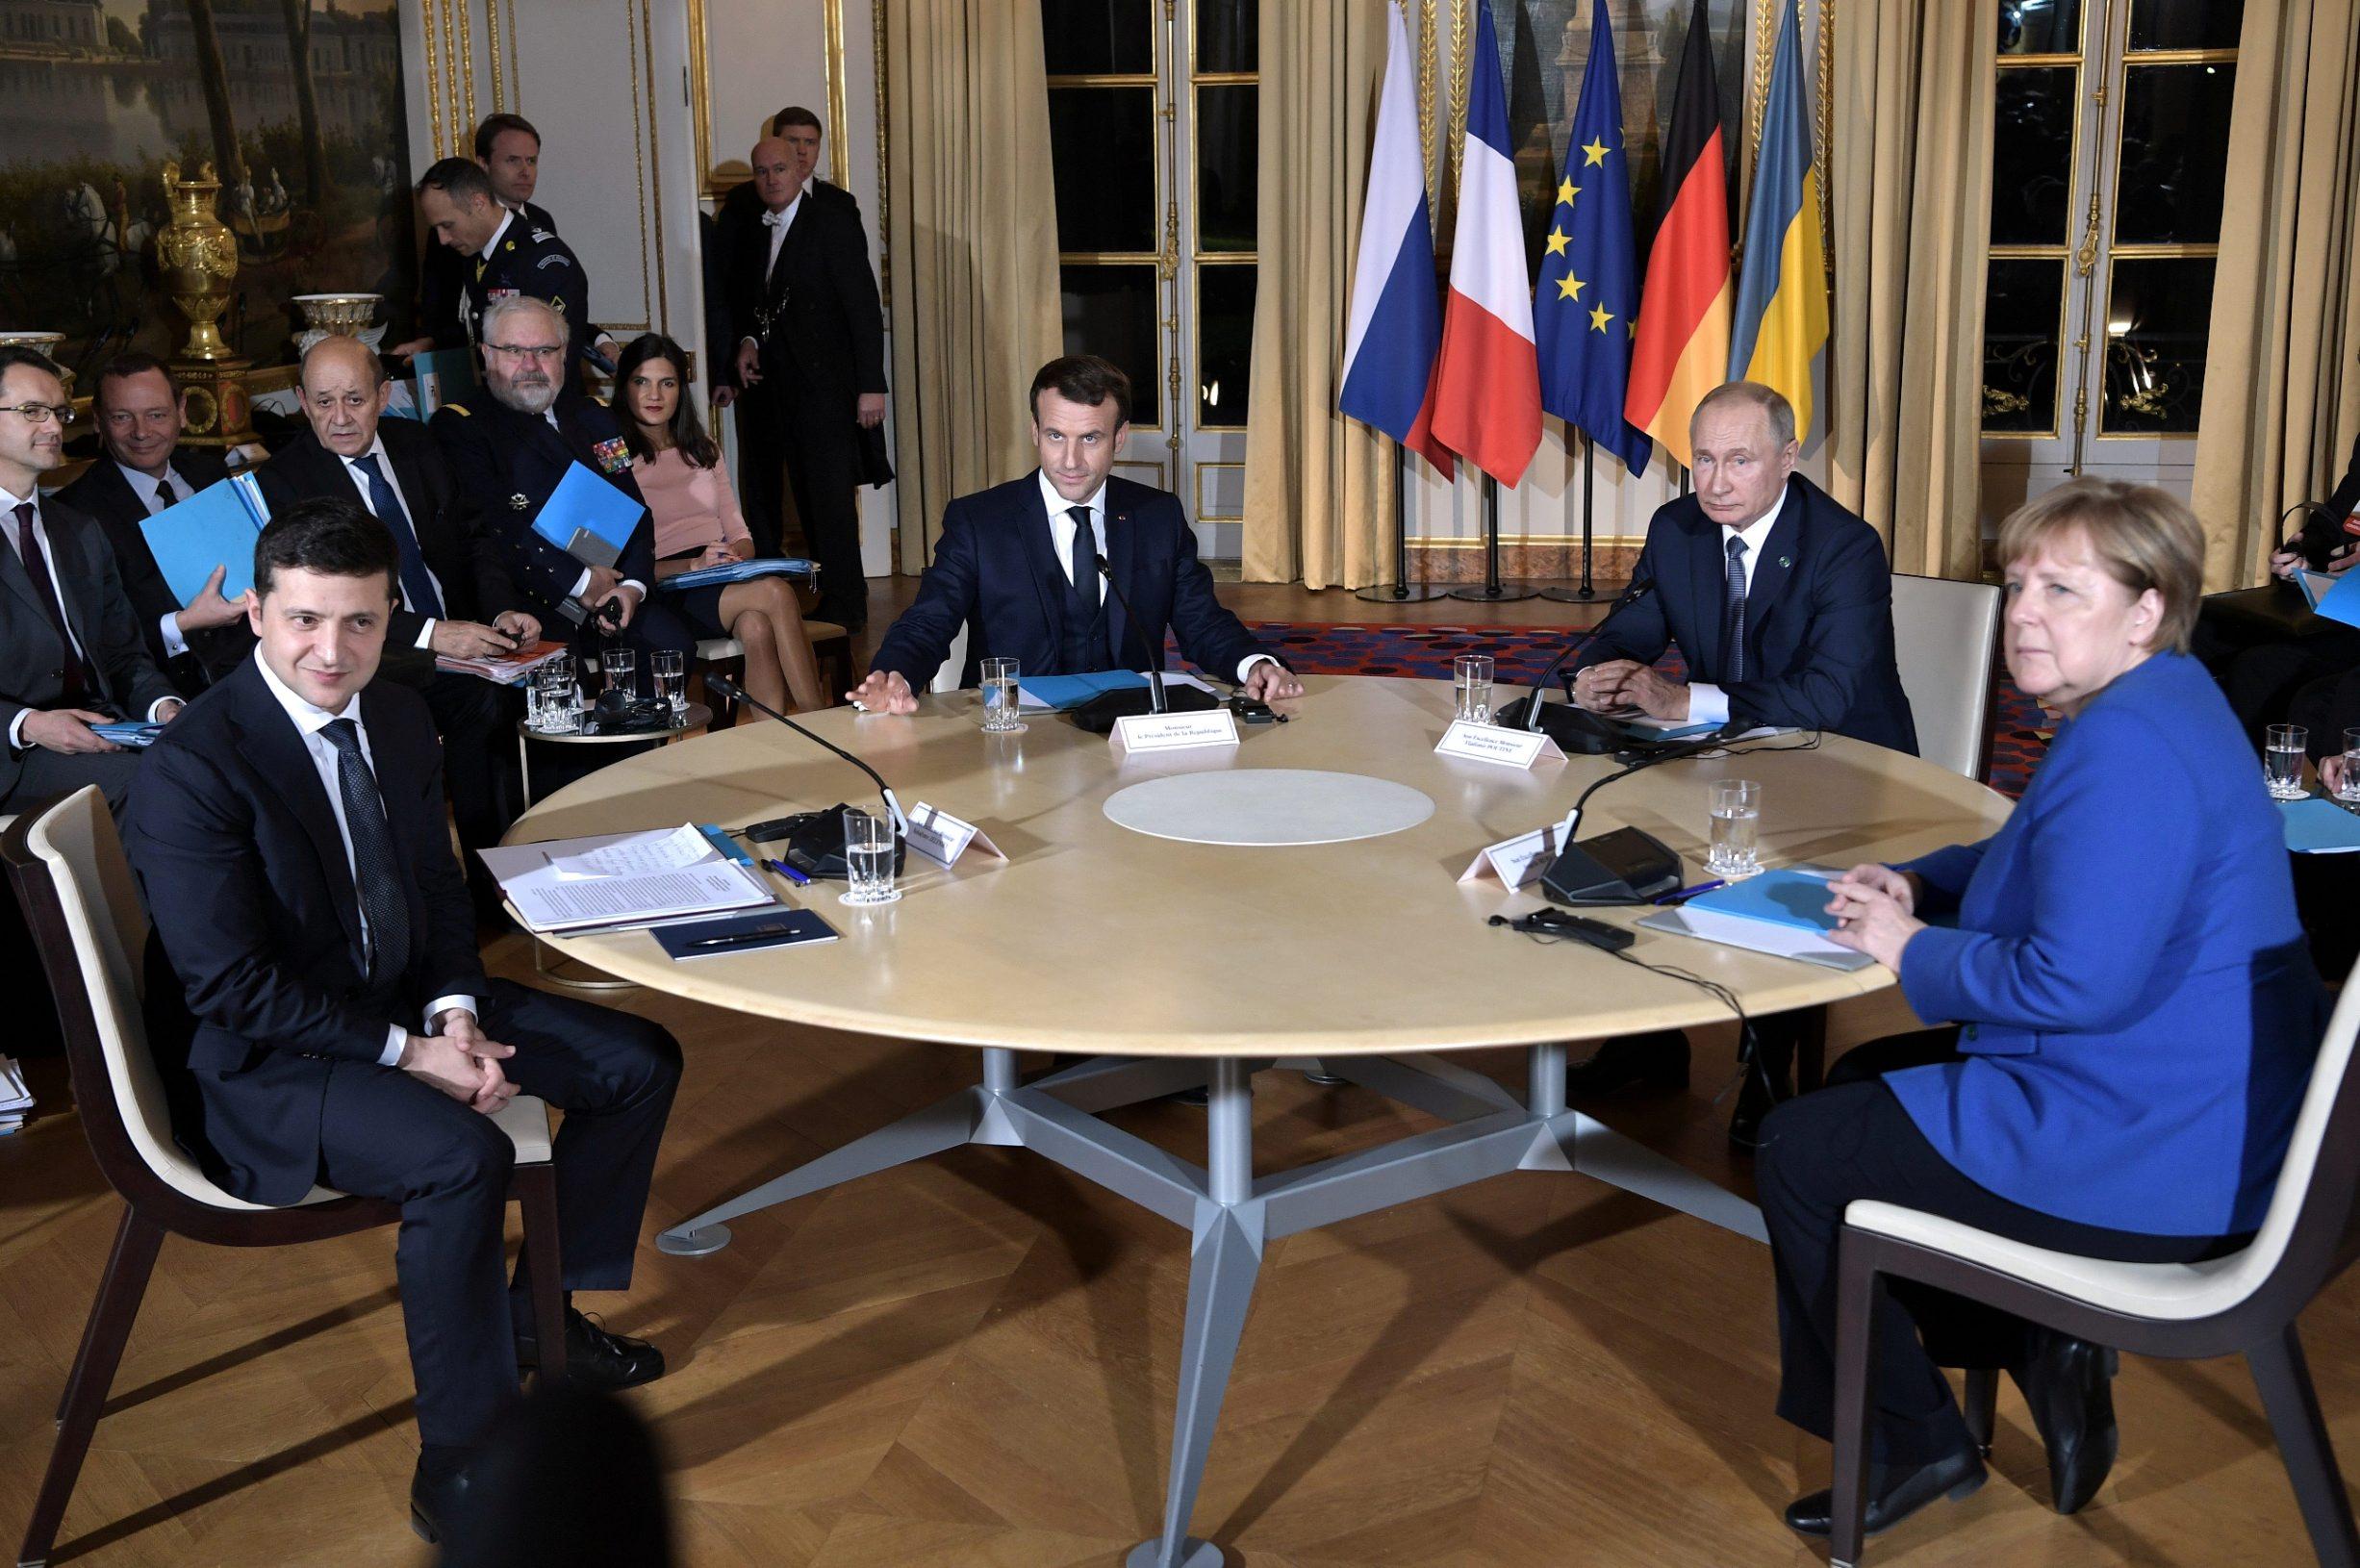 Ruski predsjednik Vladimir Putin, francuski predsjednik Emmanuel Macron, njemačka kancelarka Angela Merkel i Ukrajinski predsjednik Vladimir Zelenski tijekom summita u Parizu, 9.prosinac, 2019.